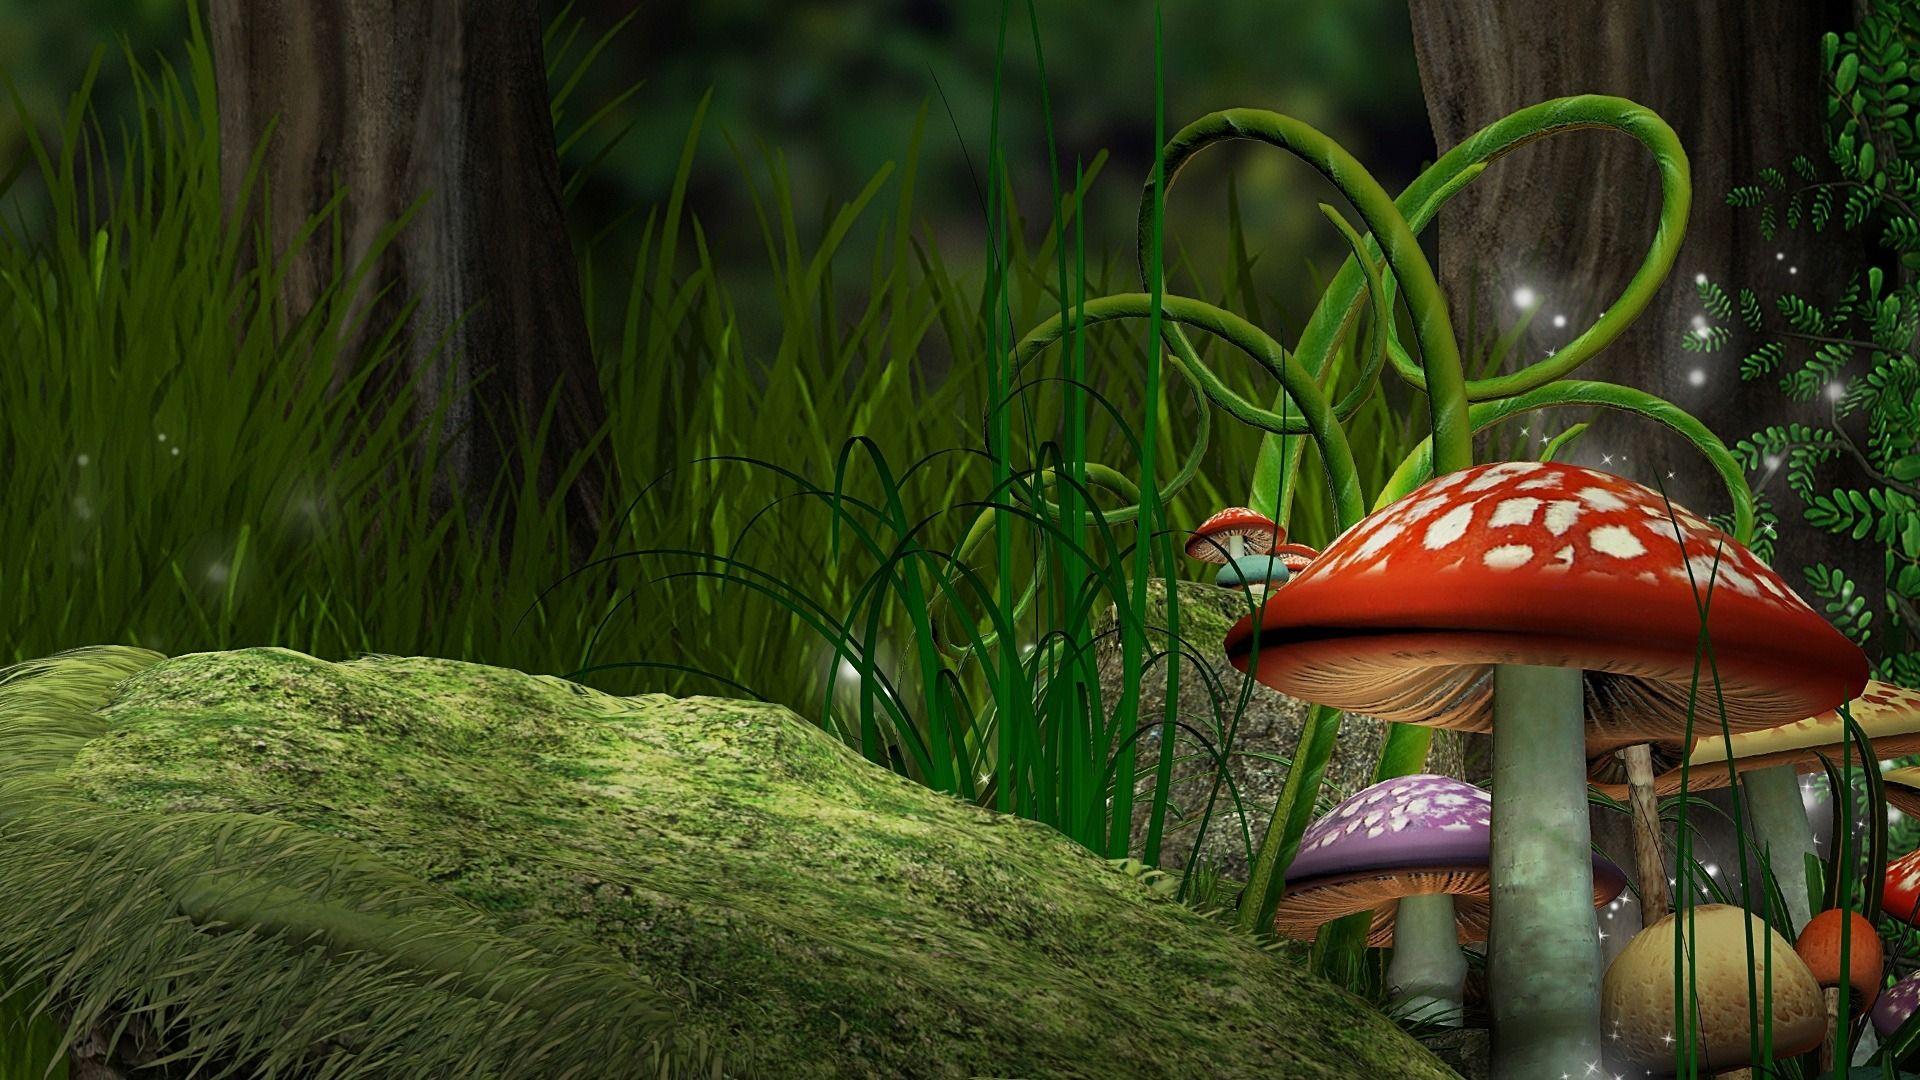 Fantasy Mushrooms Hd Wallpaper Abstrak Wallpaper Hd Gambar